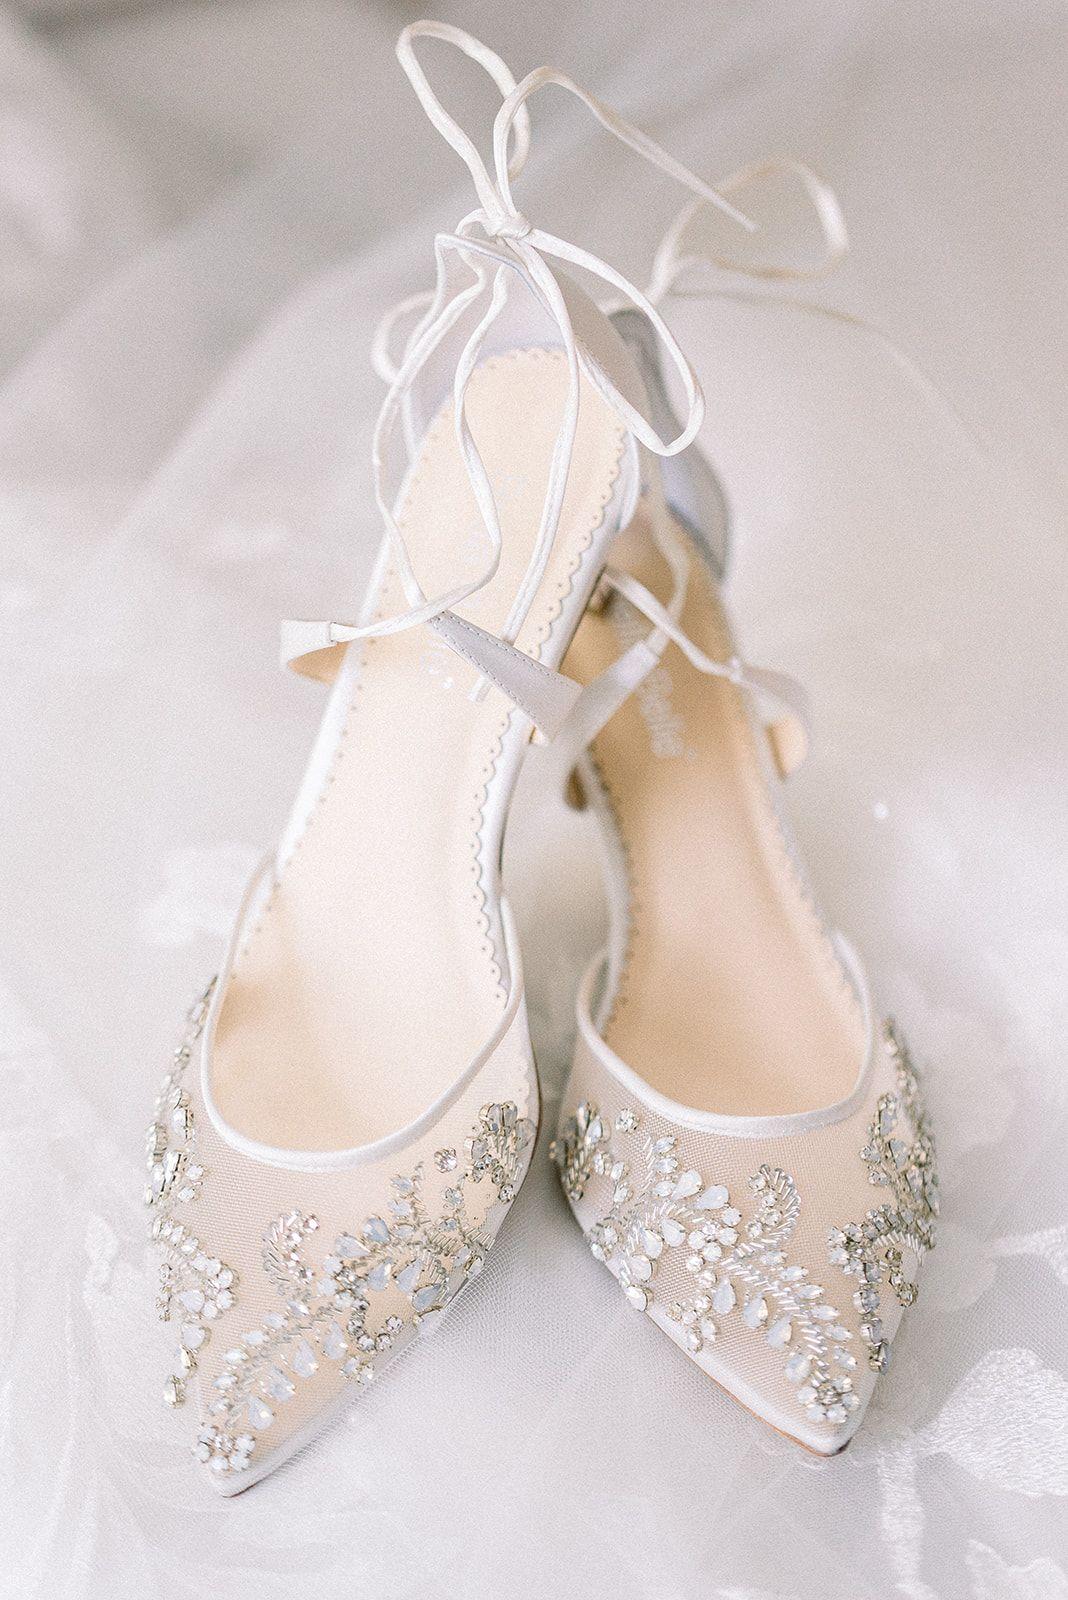 Brides Most Favorite Sparkly Wedding Heel In 2020 Wedding Shoes Heels Ivory Wedding Shoes Wedding Shoes Low Heel